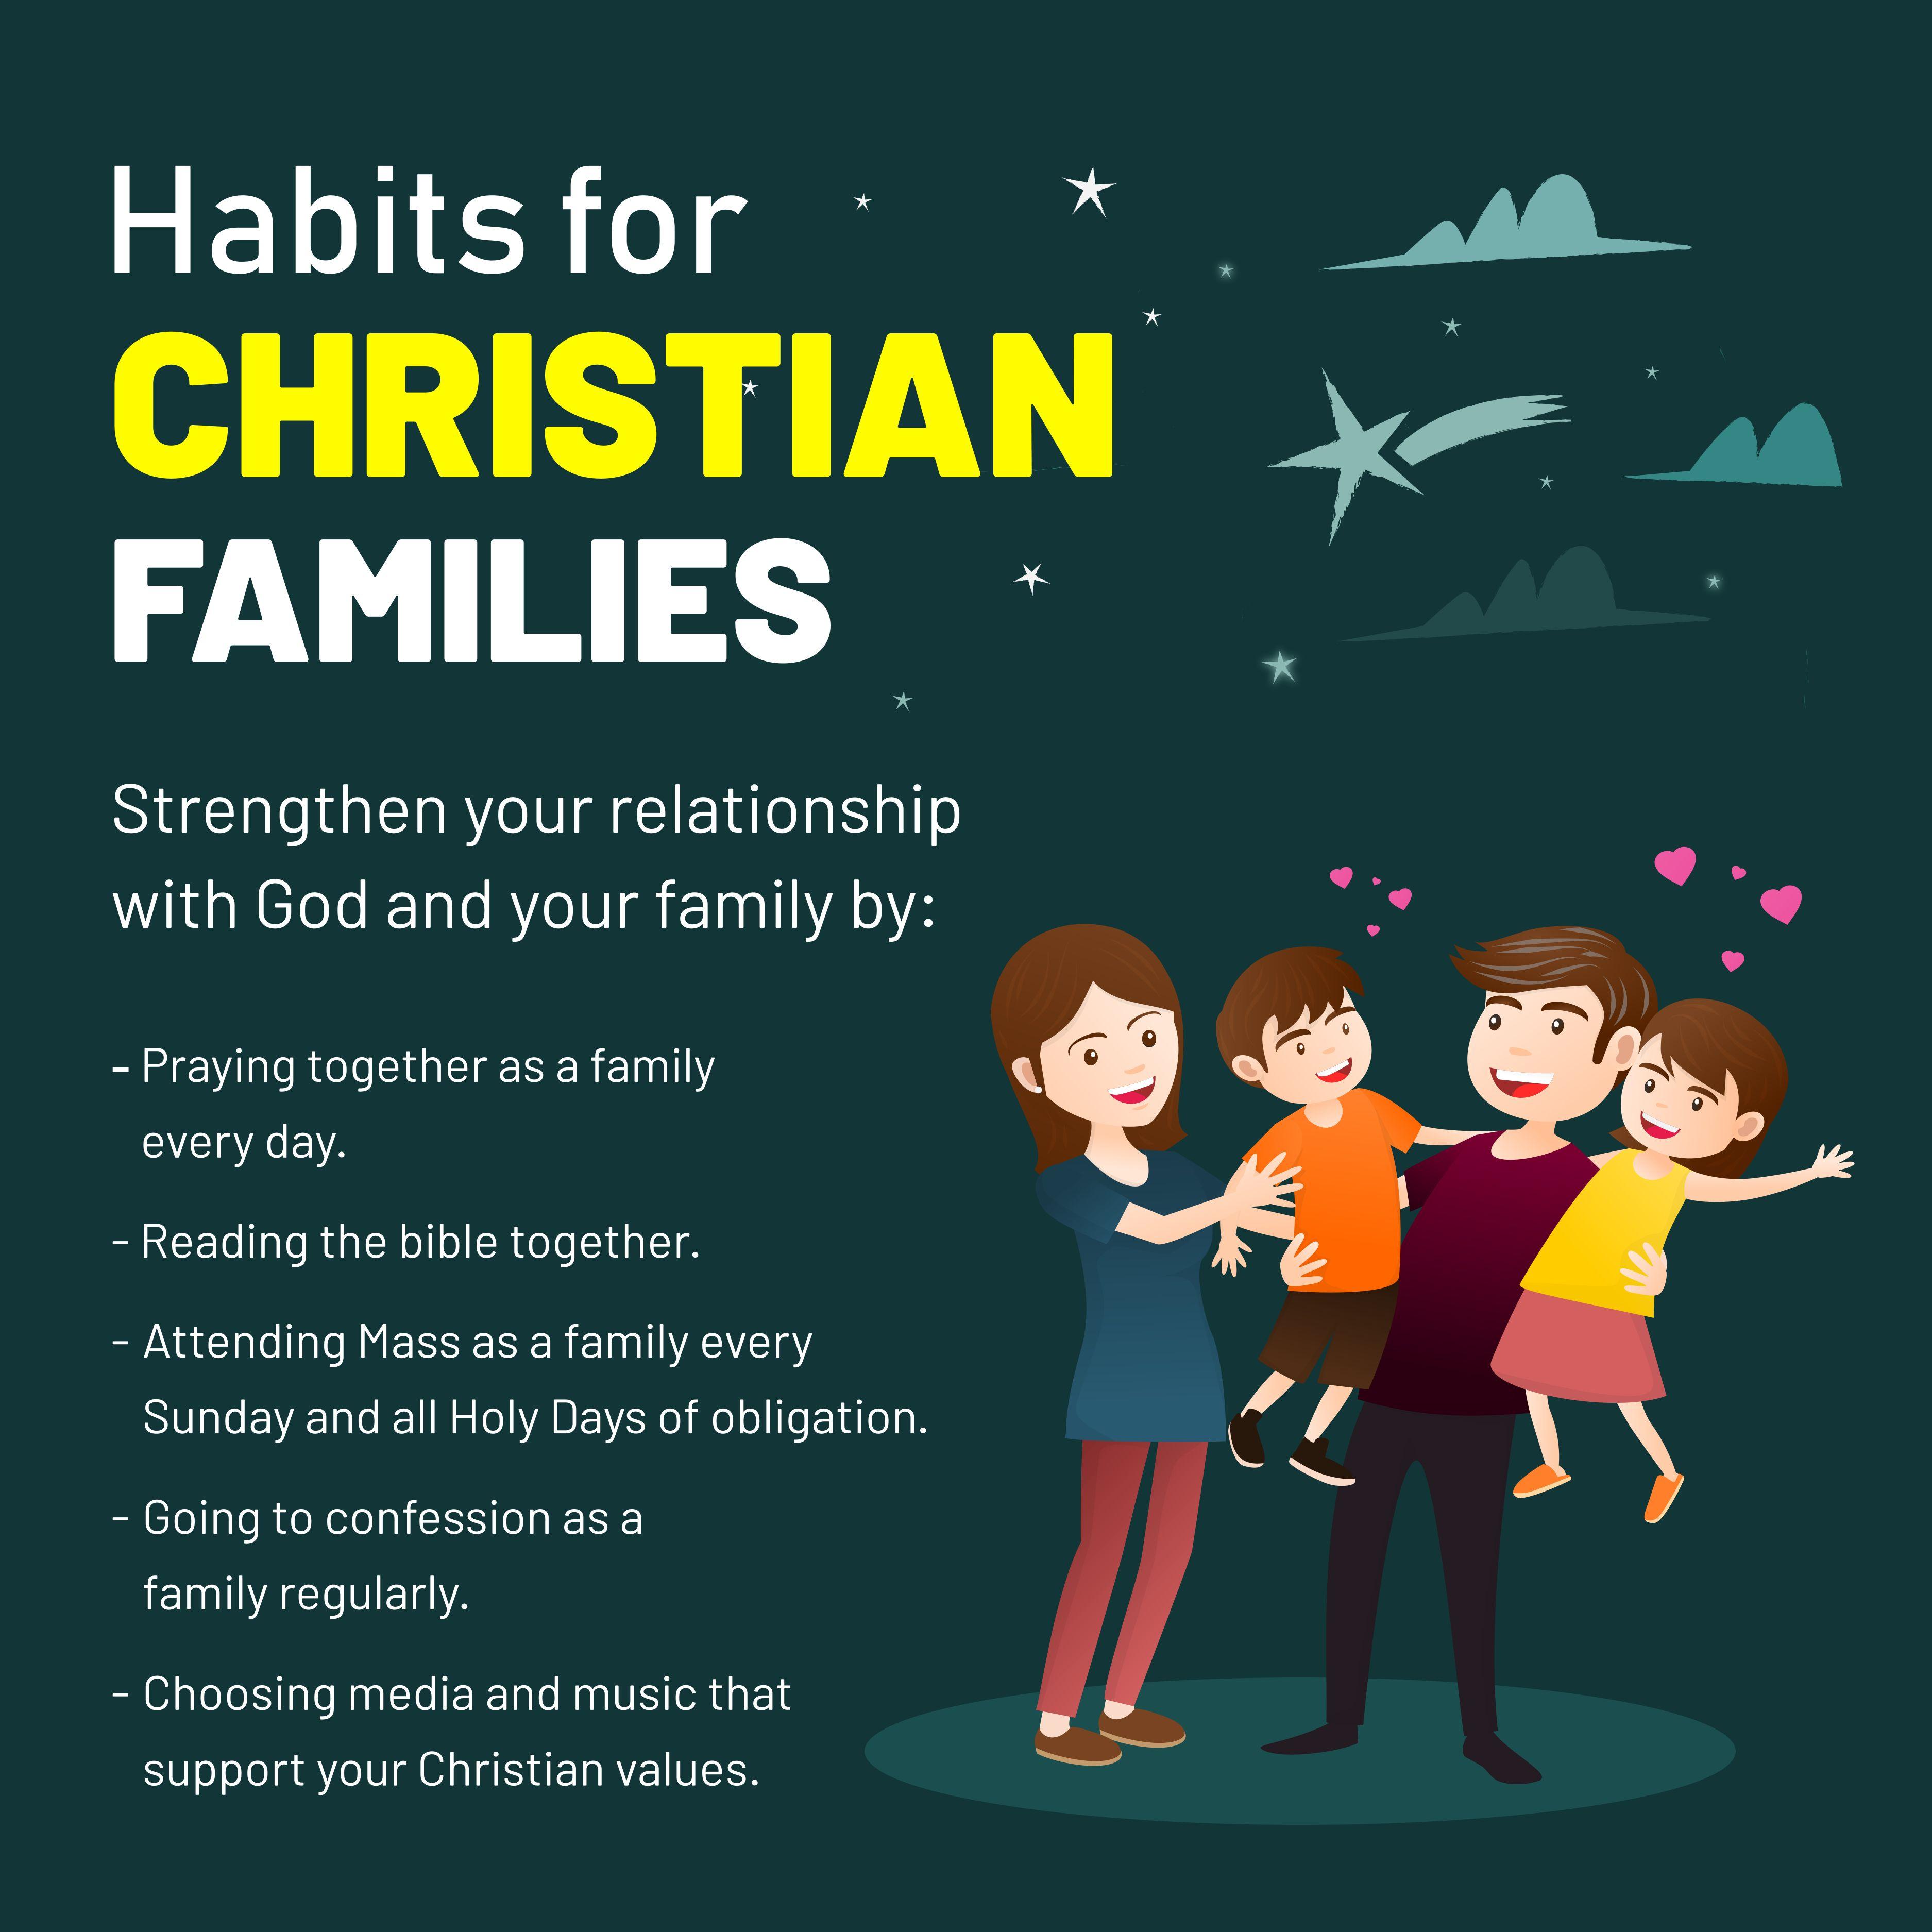 Habits for Christian Families ChristianFamilies